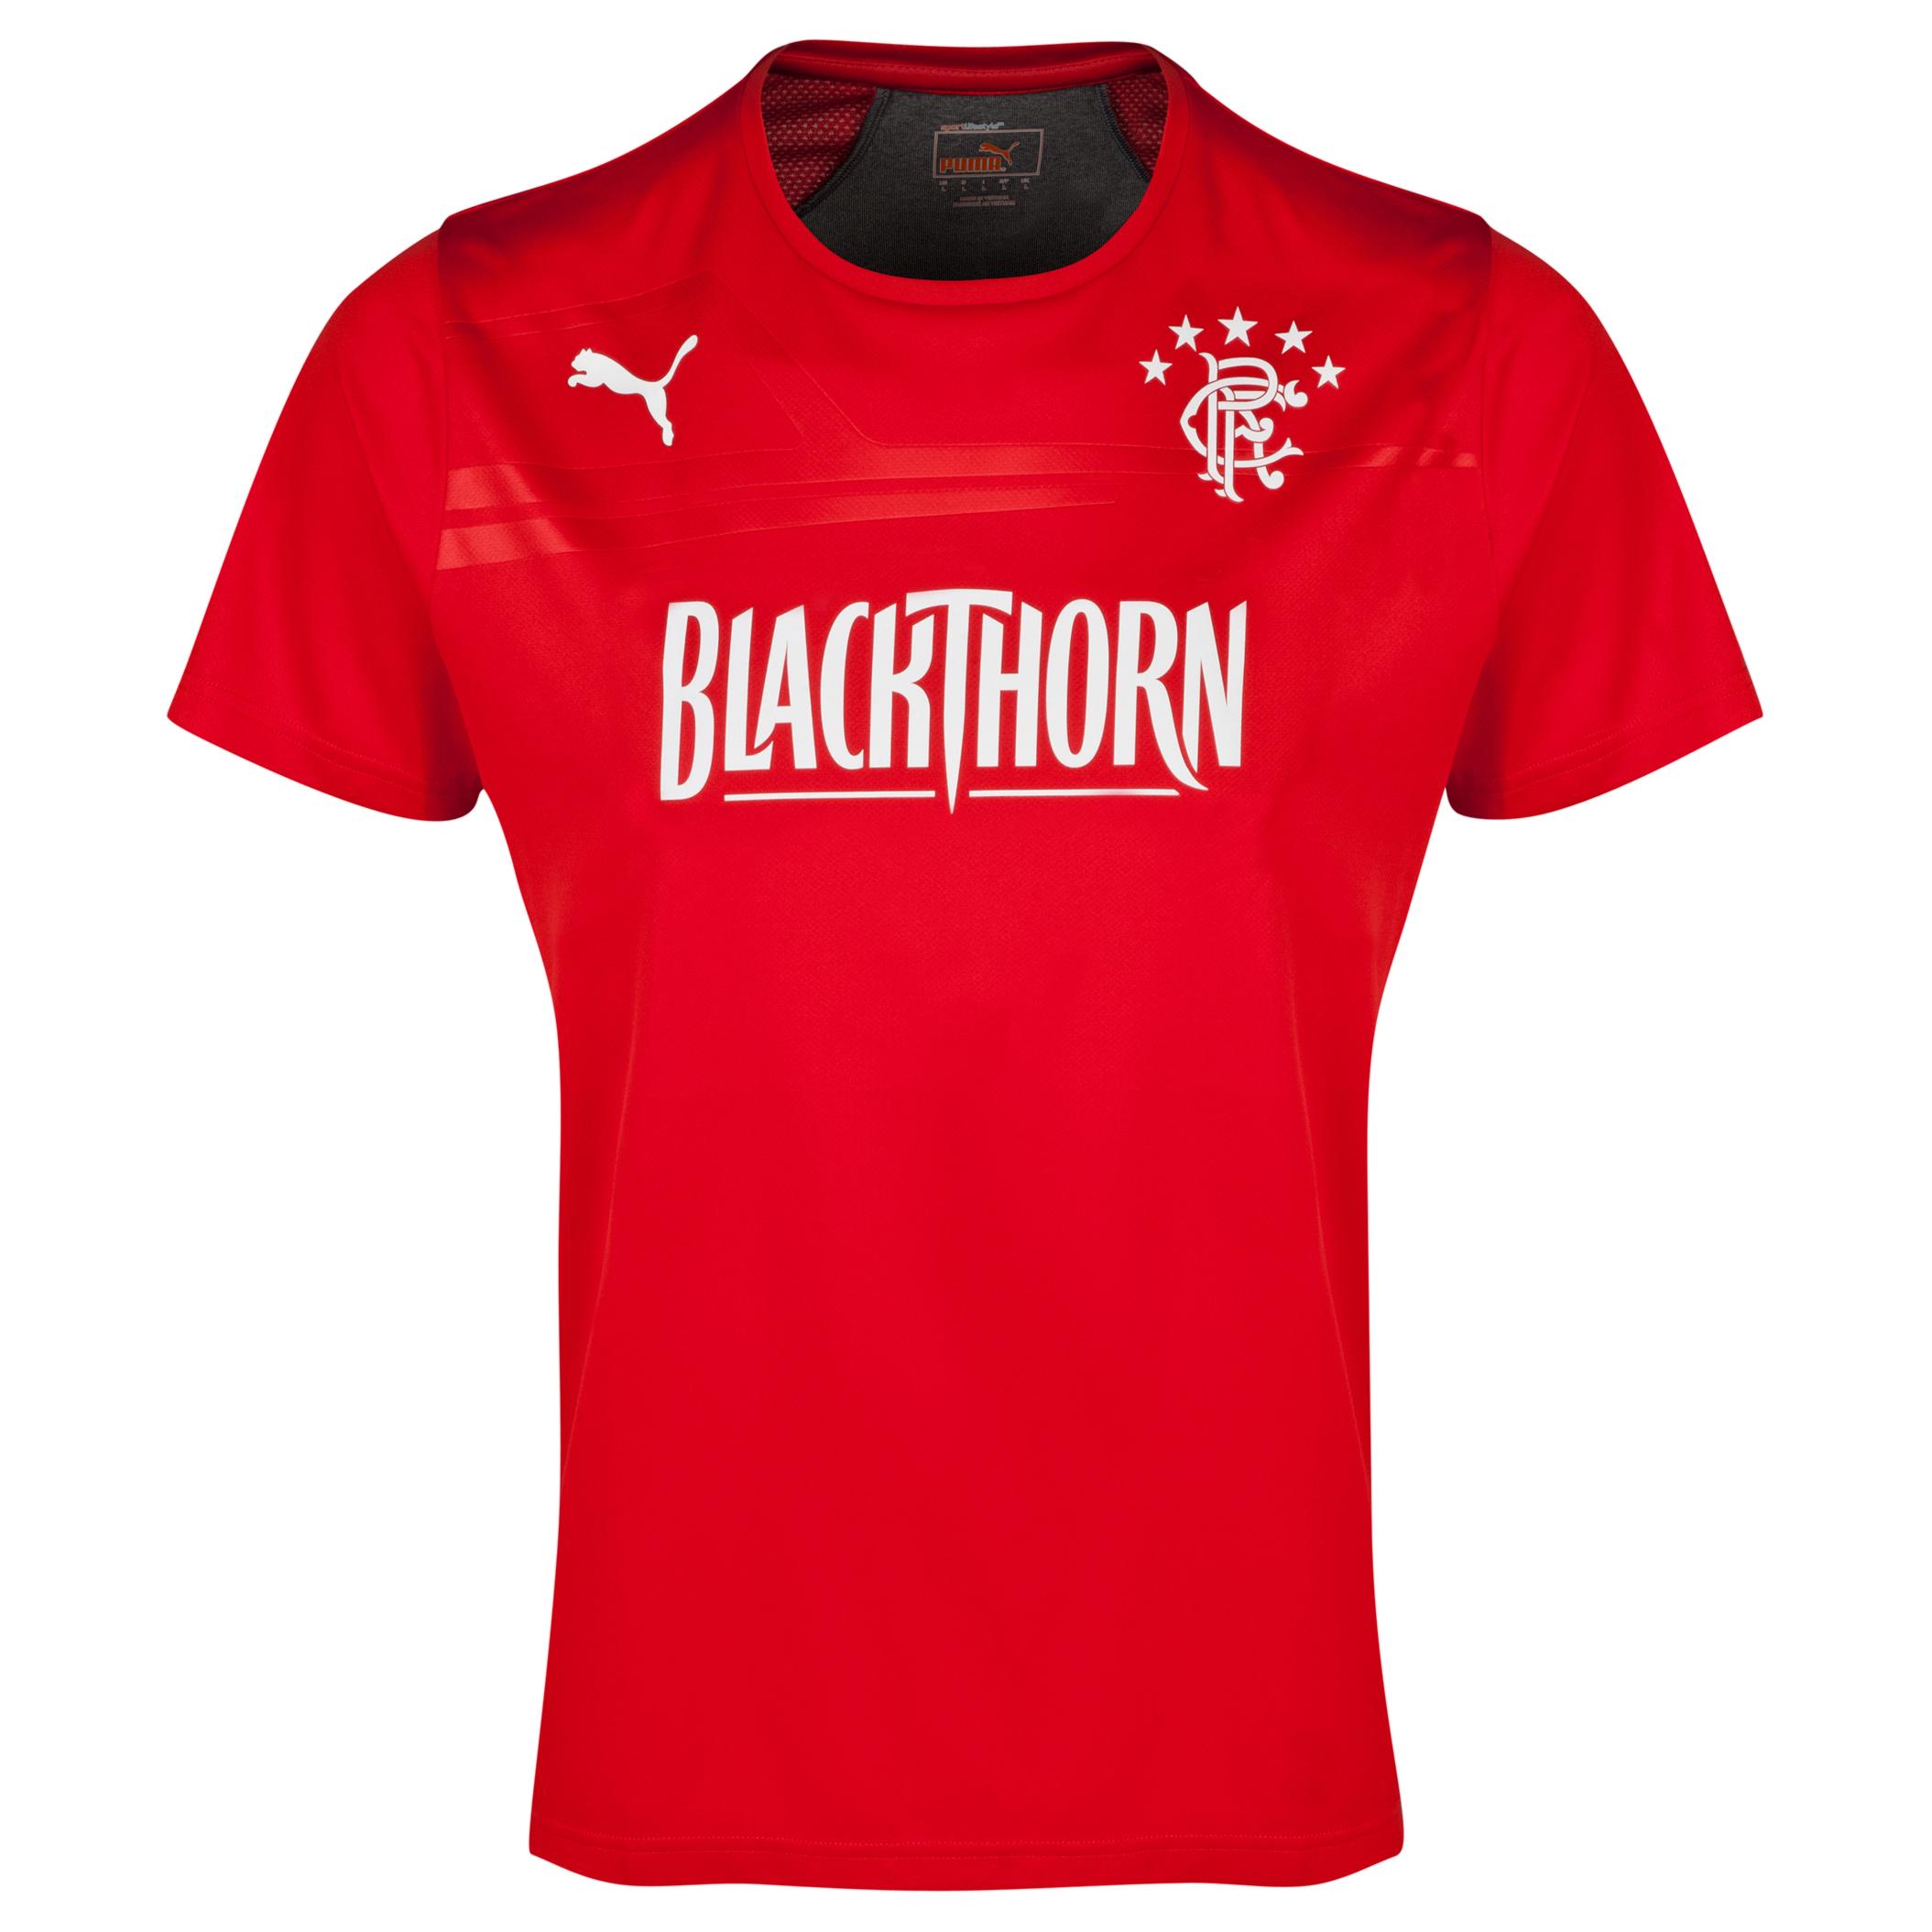 Glasgow Rangers King Performance T-Shirt - Puma Red/Dark Grey Heather Red